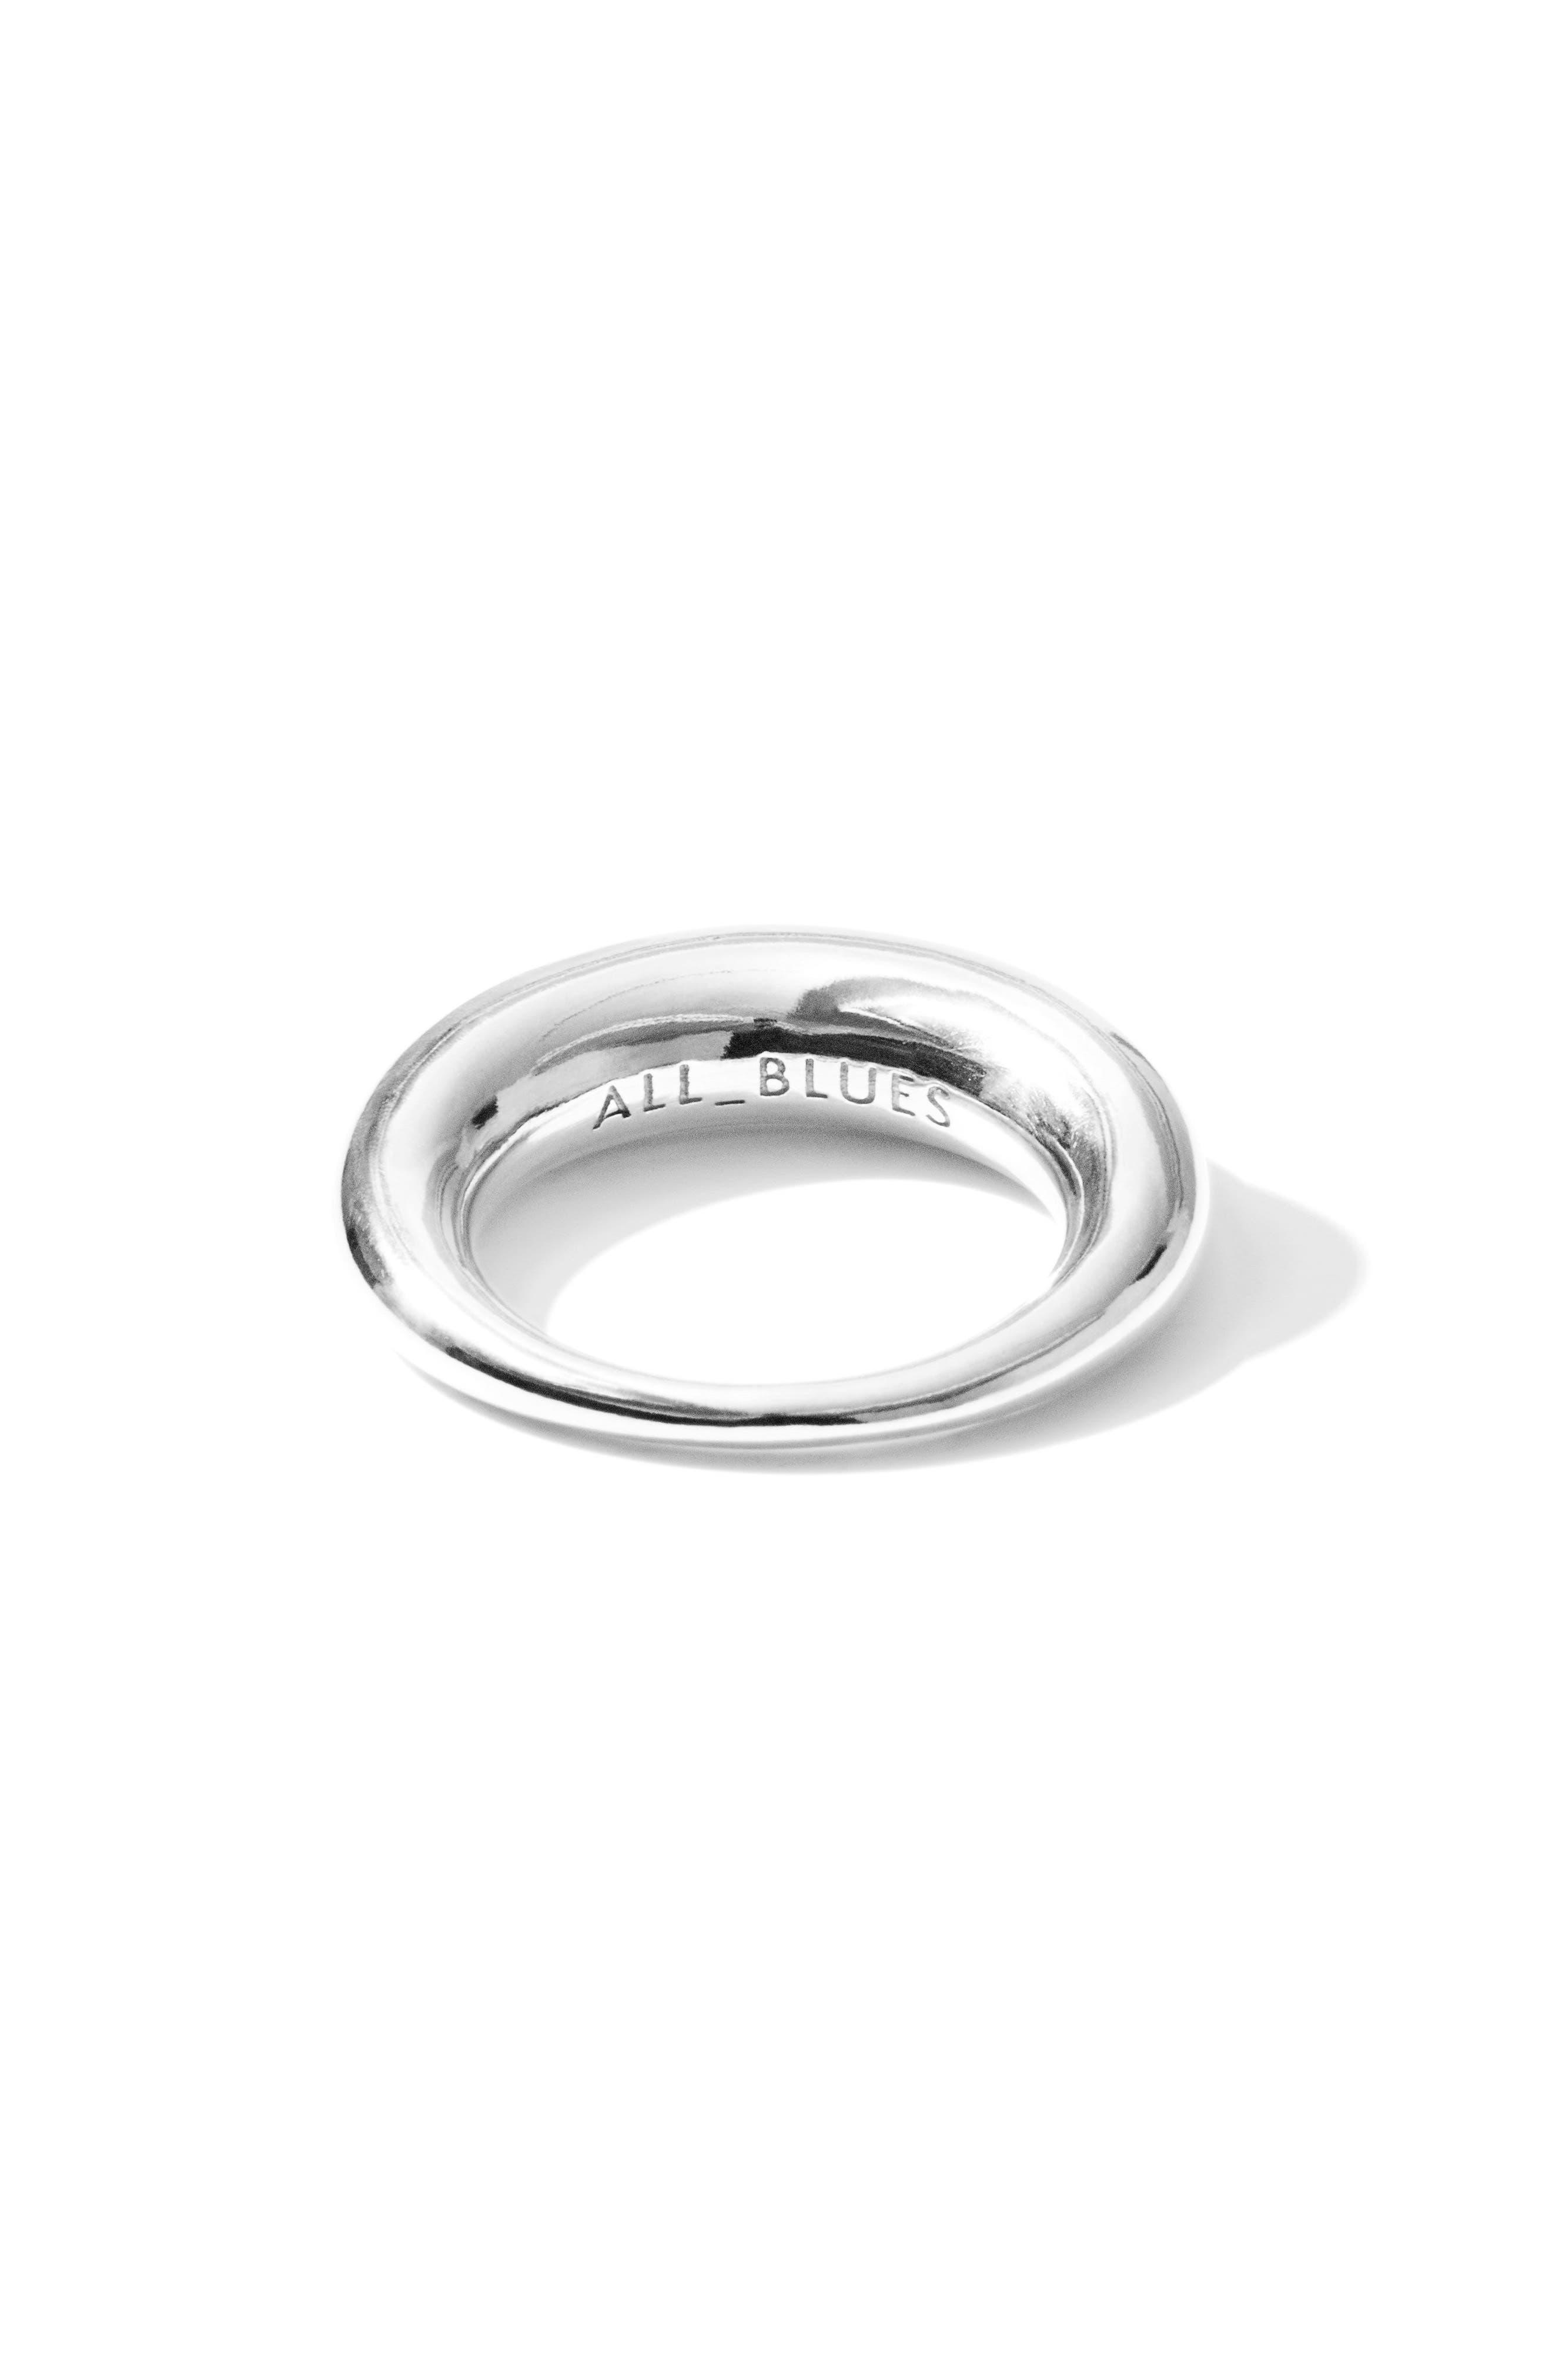 Large Snake Polished Silver Ring,                             Alternate thumbnail 3, color,                             POLISHED SILVER